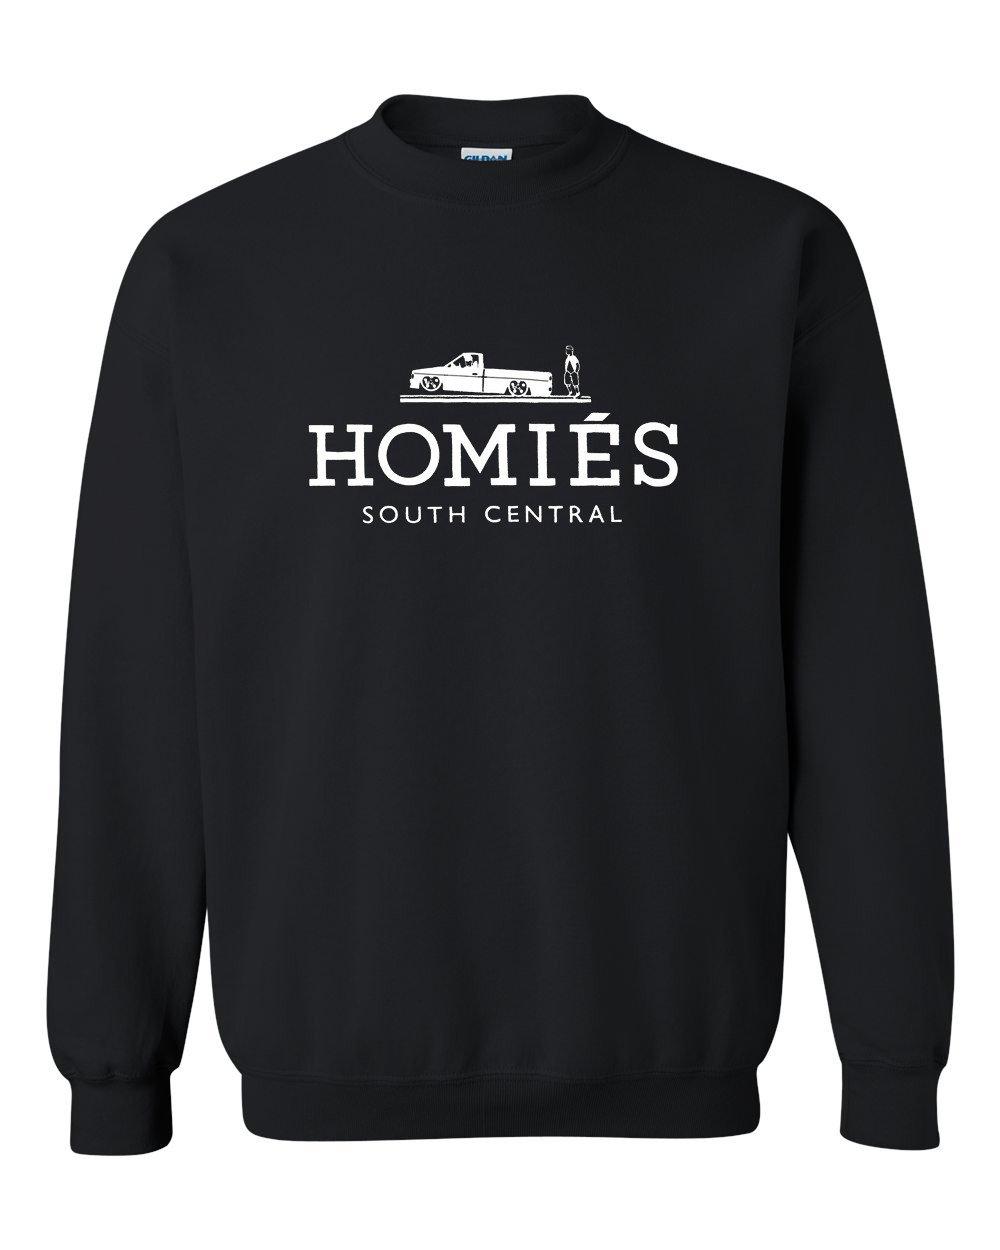 homies south central sweatshirt